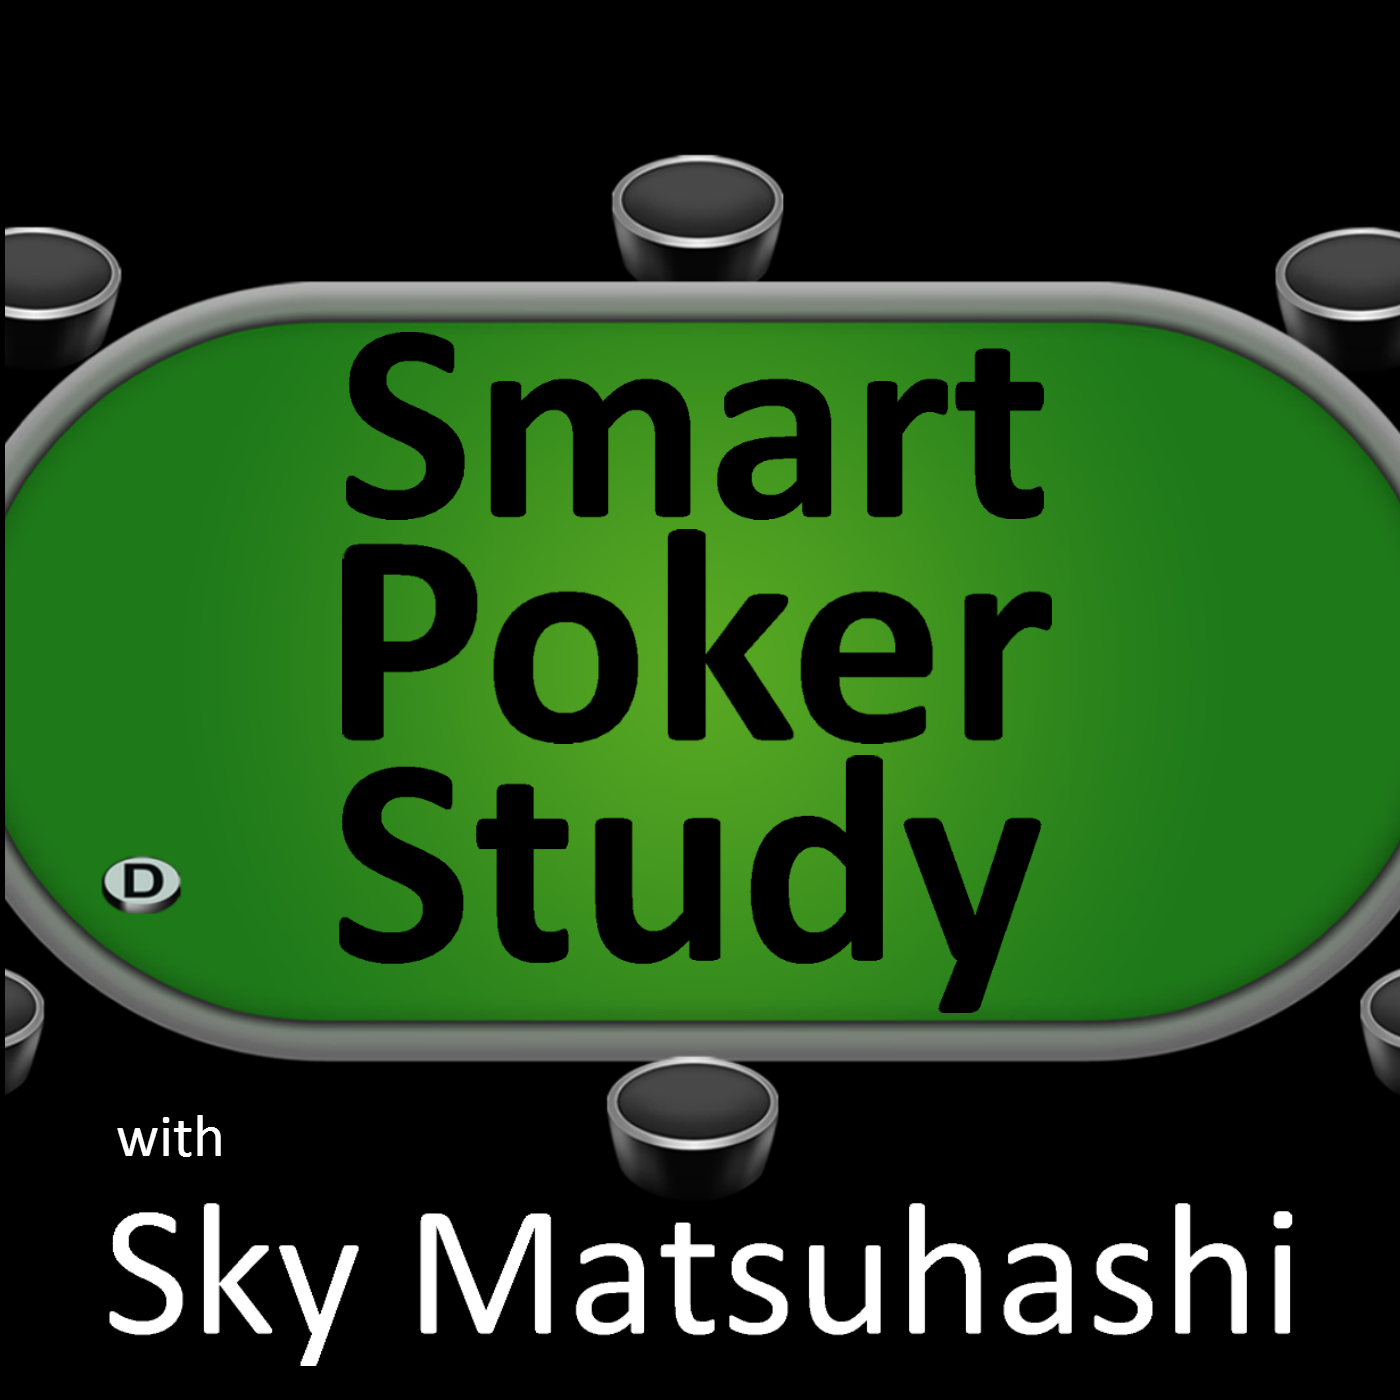 Smart Poker Study Podcast show art